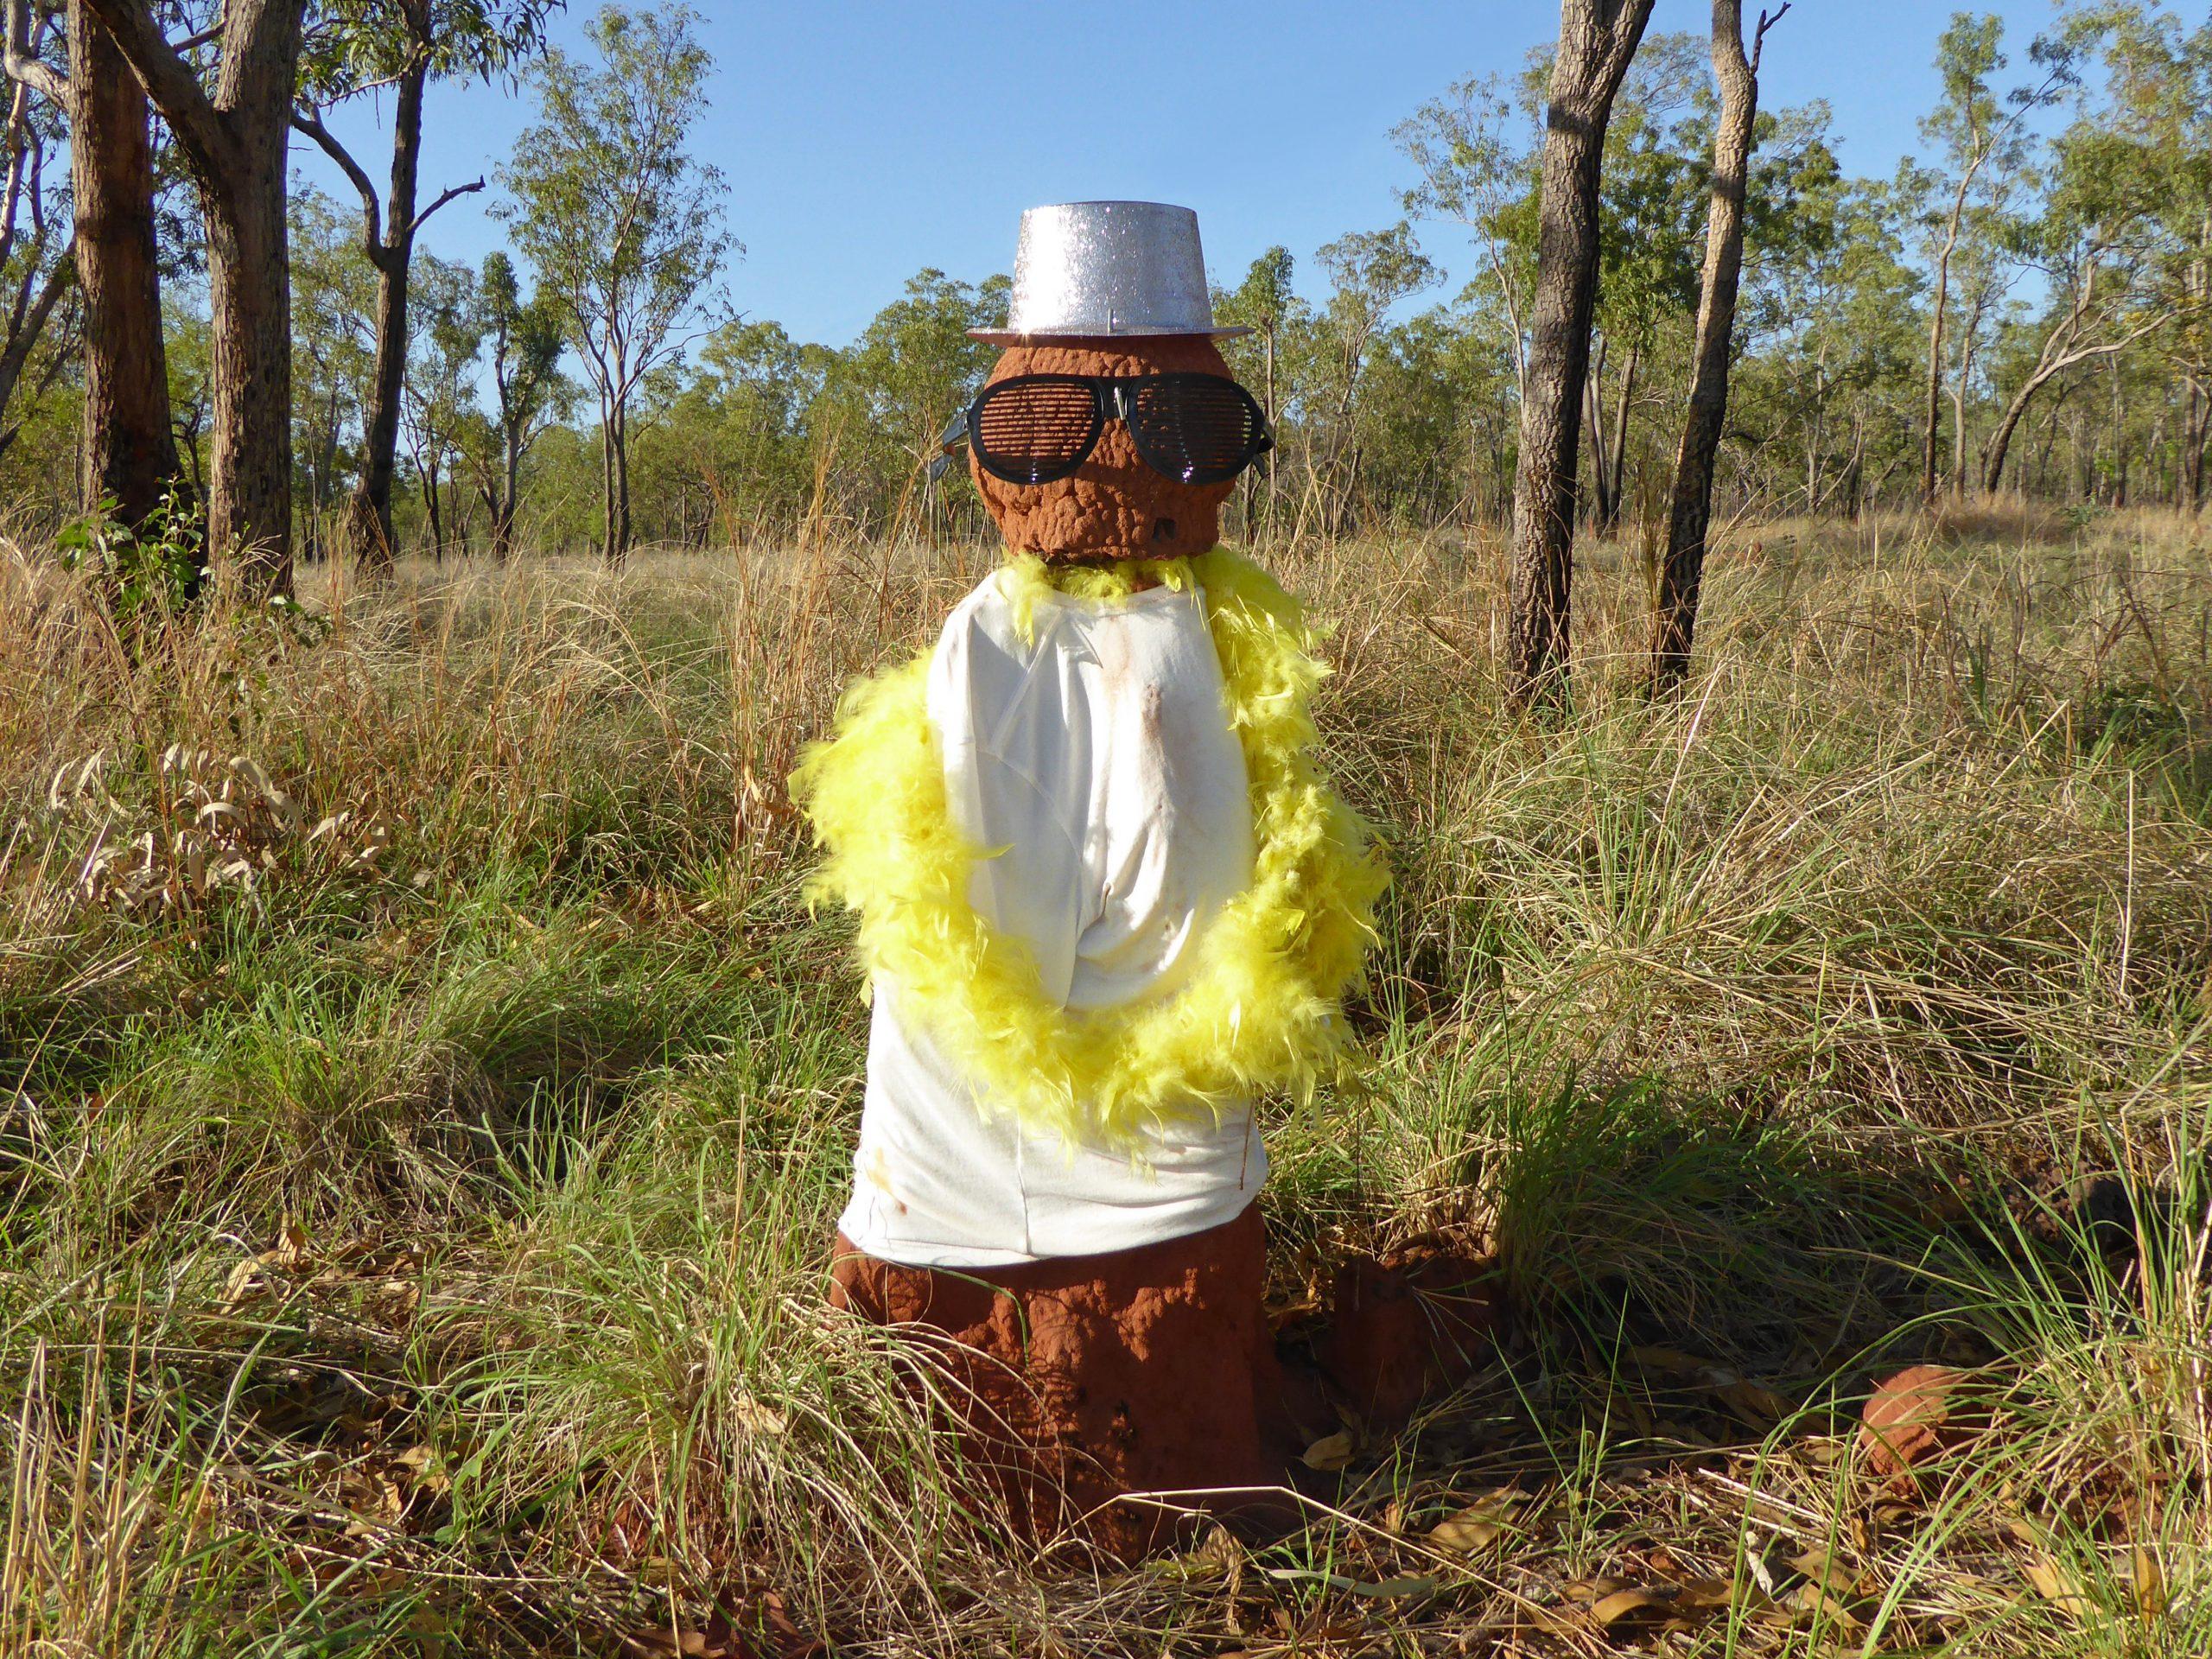 Radreise Australien 2016 - Stuart Highway - Termitenhügel